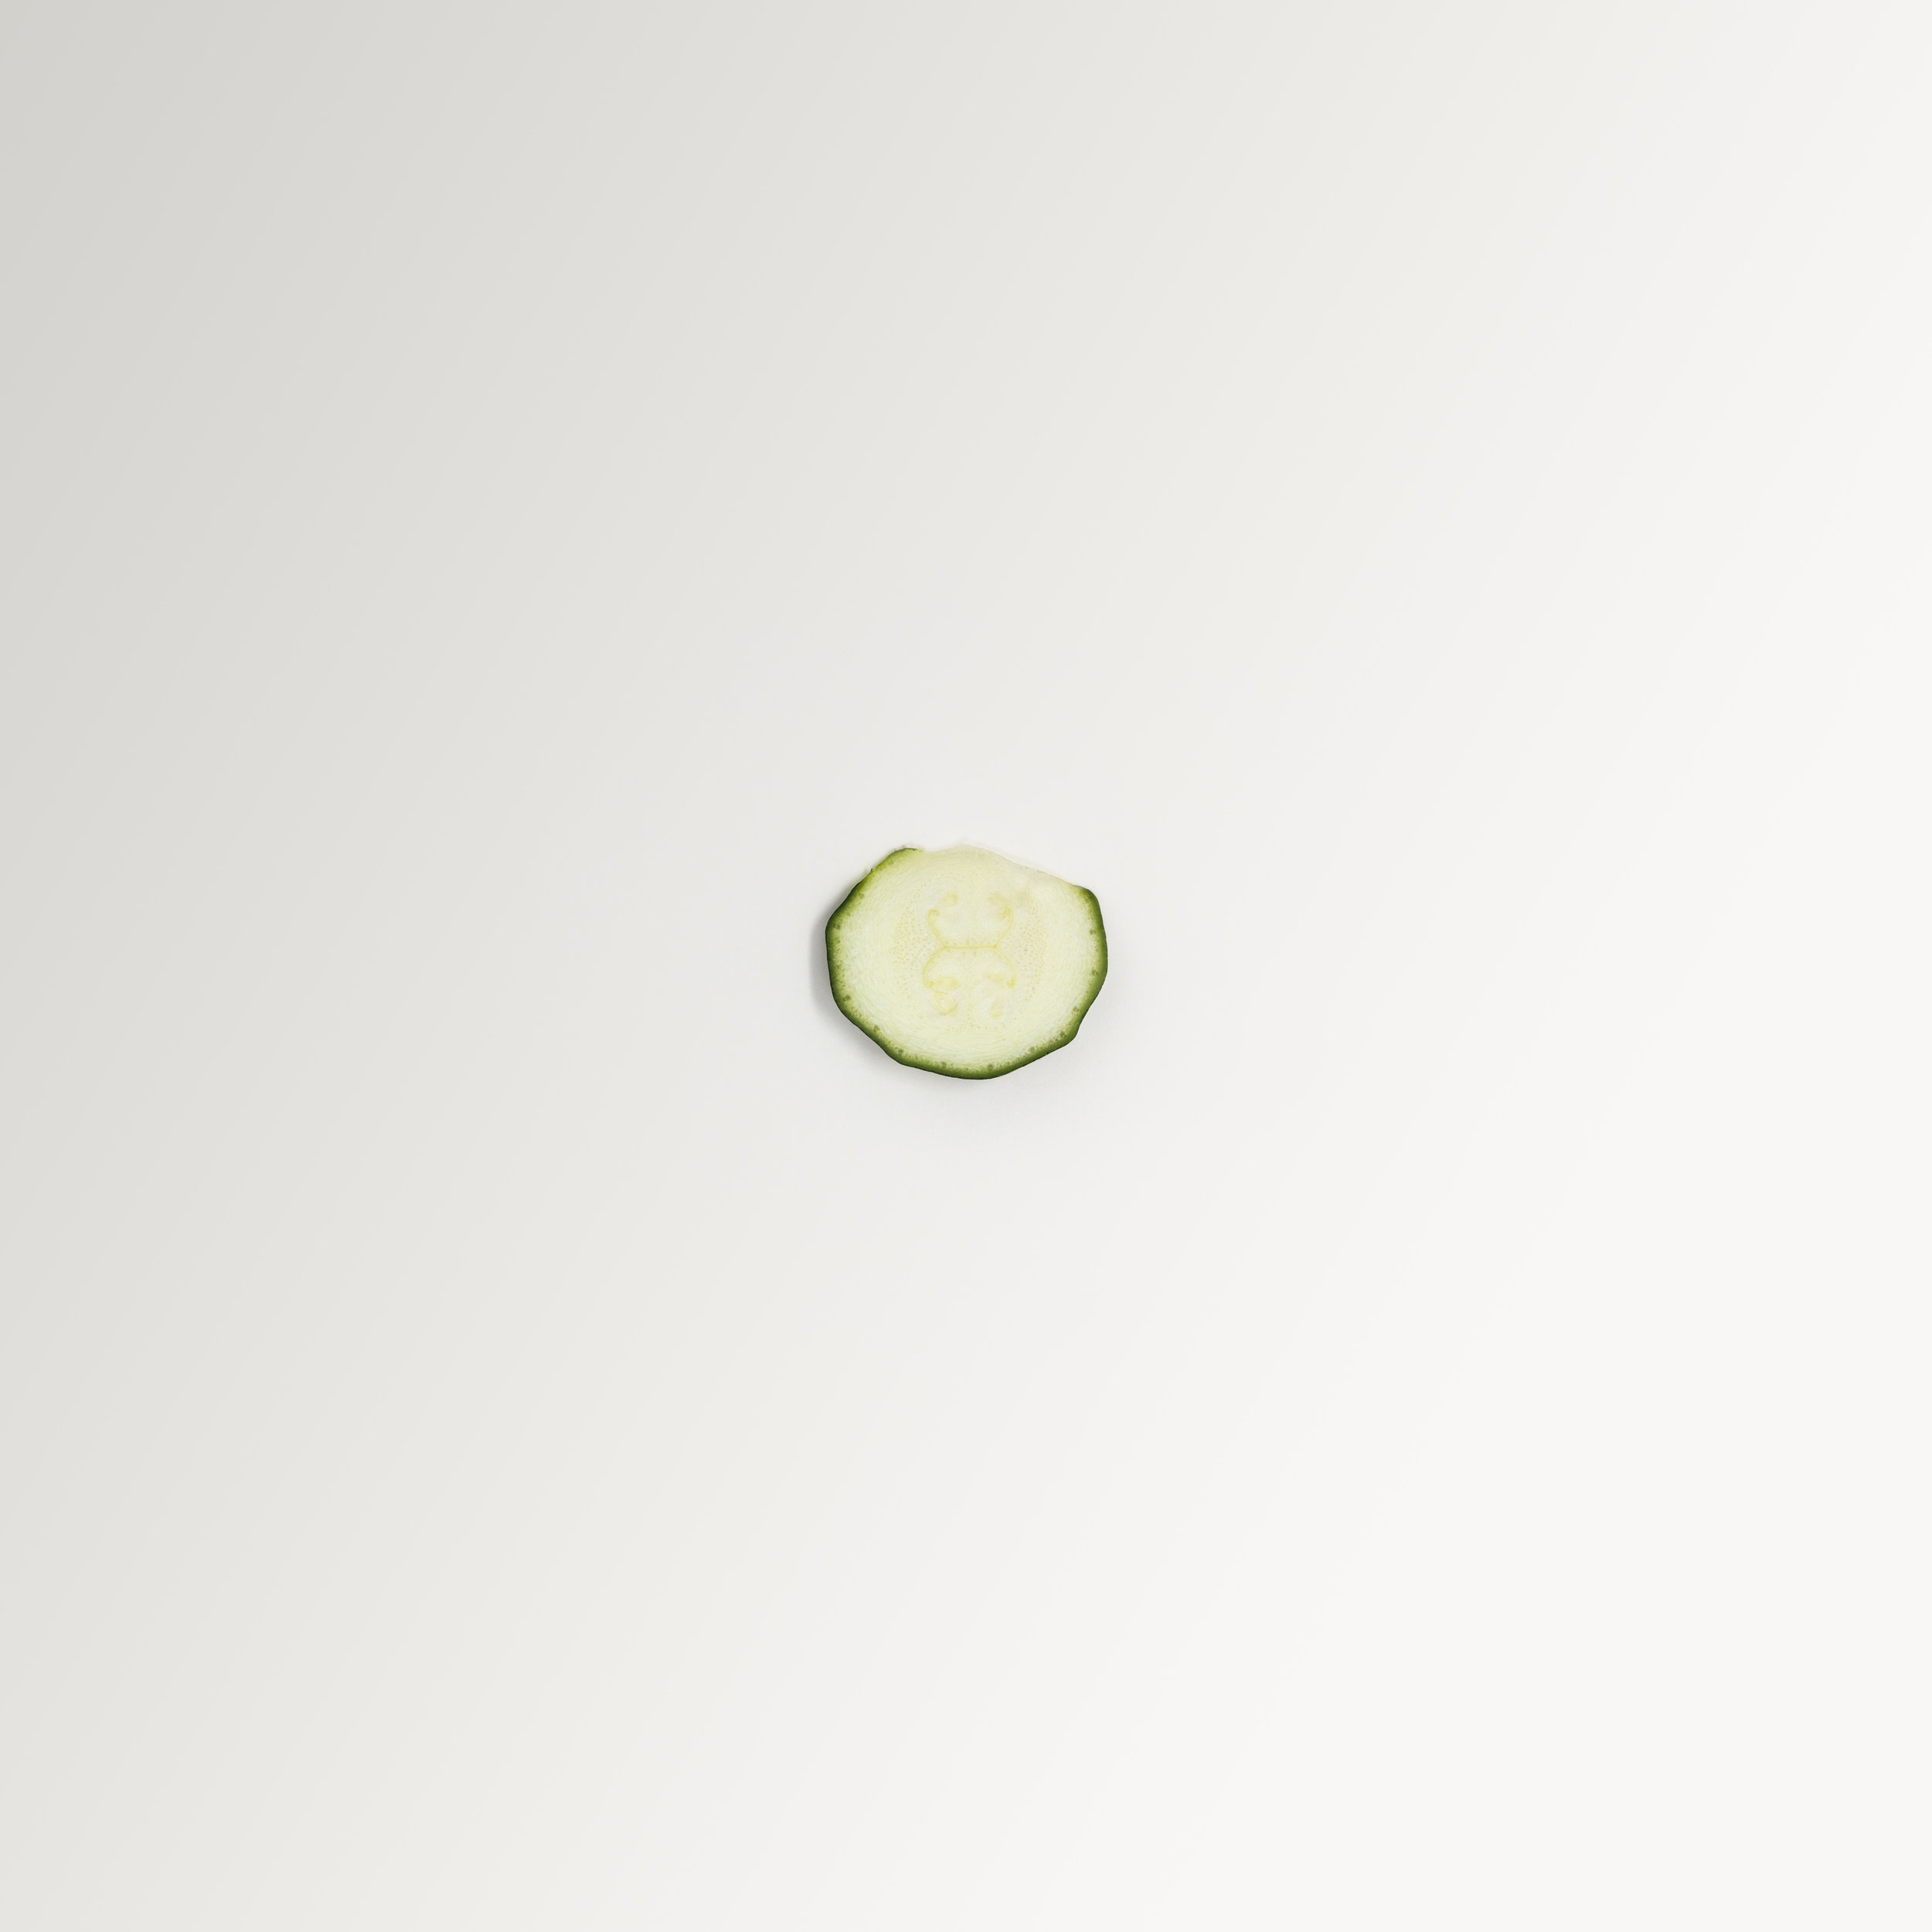 A simple, minimalist, contemporary, fine art photograph of a slice of cucumber